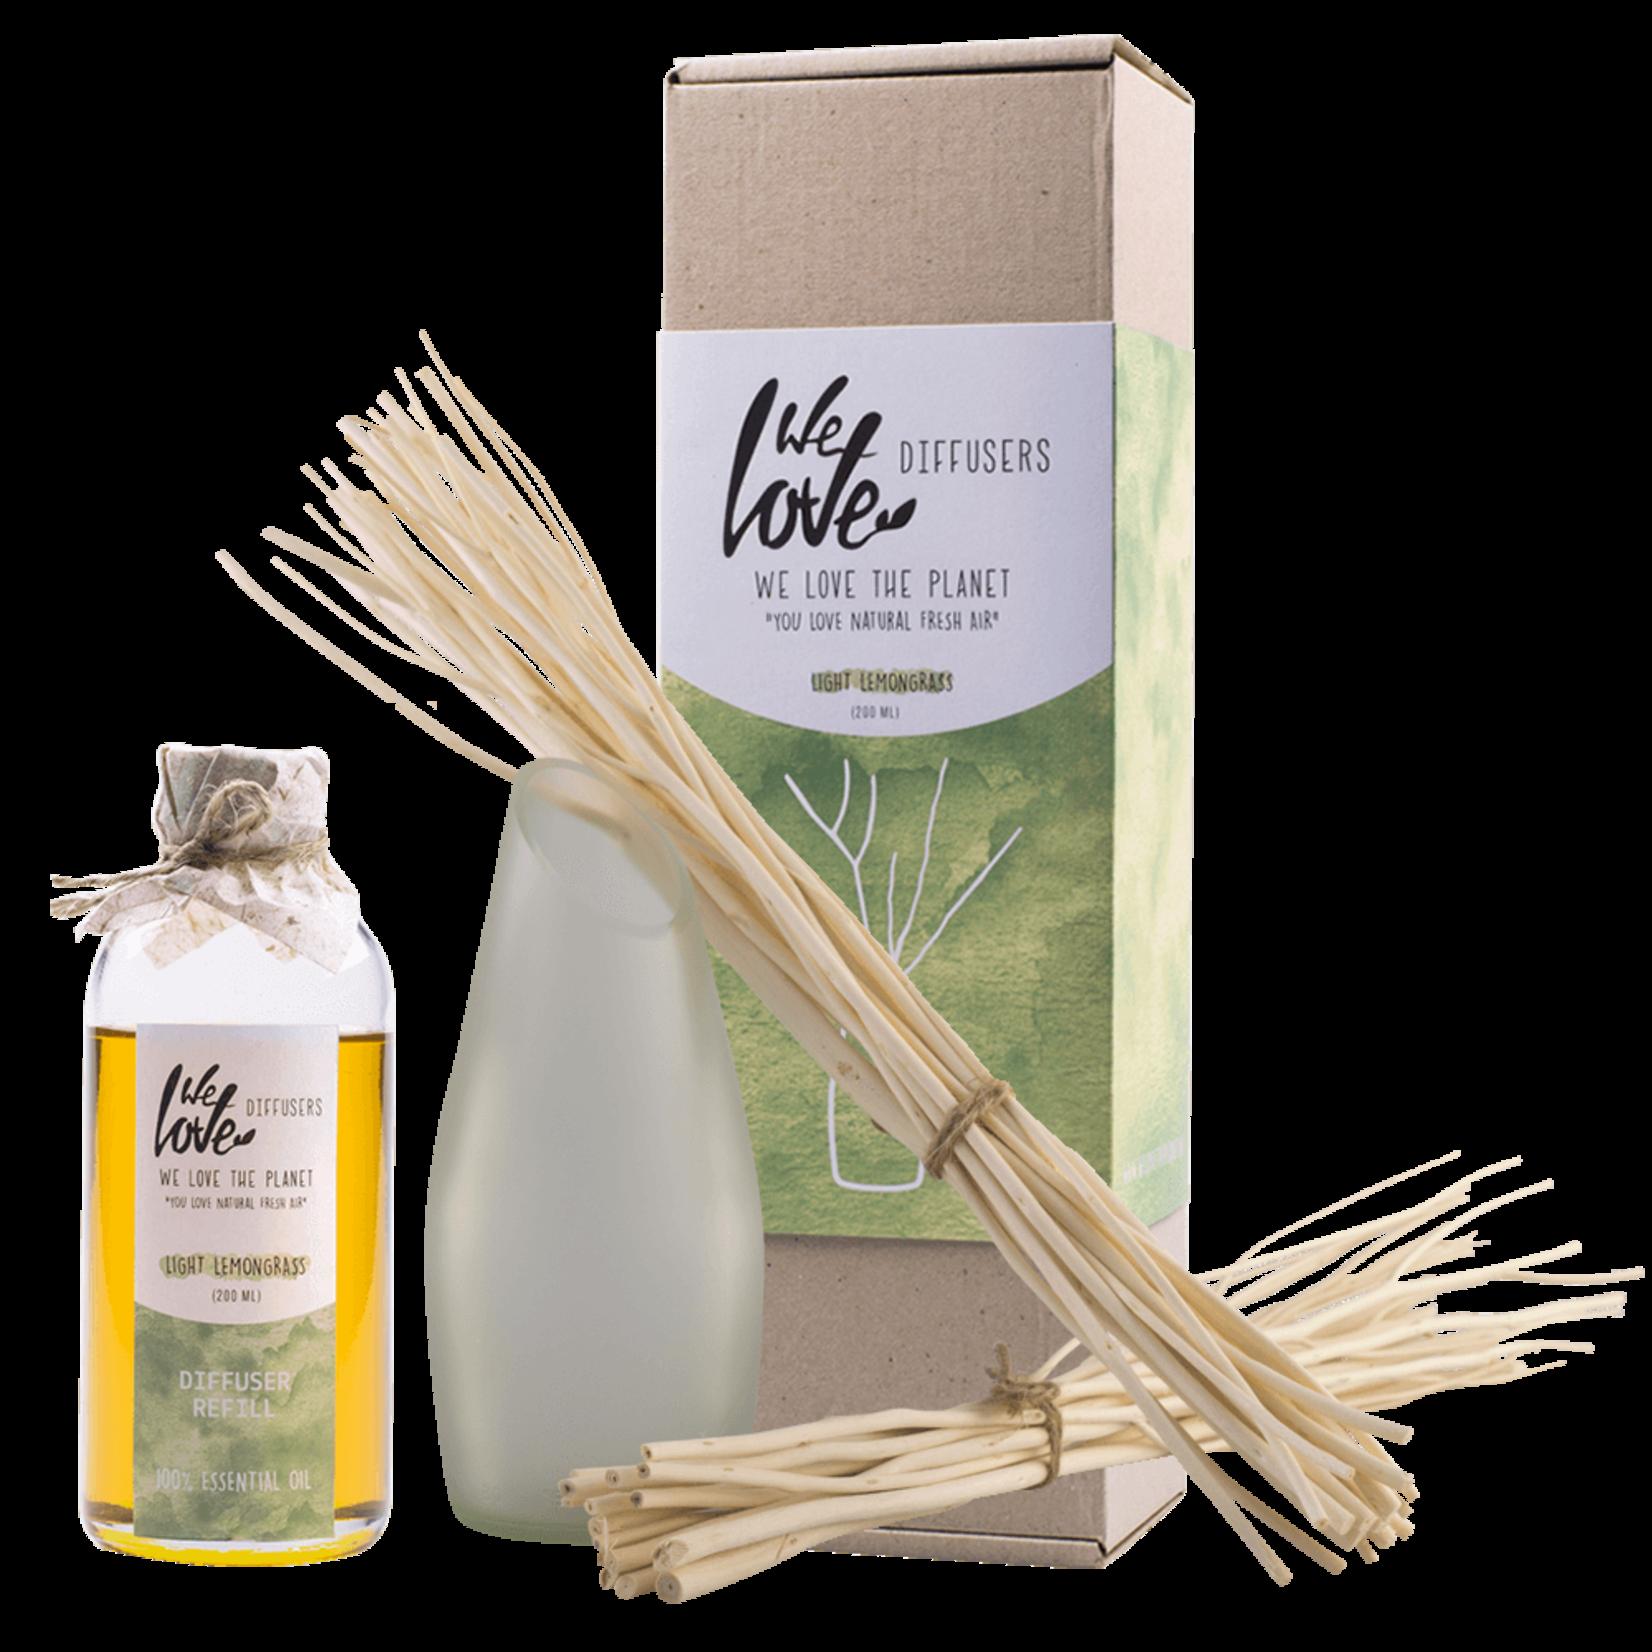 Diffuser set - Light Lemon Grass 200ml (essential oil)